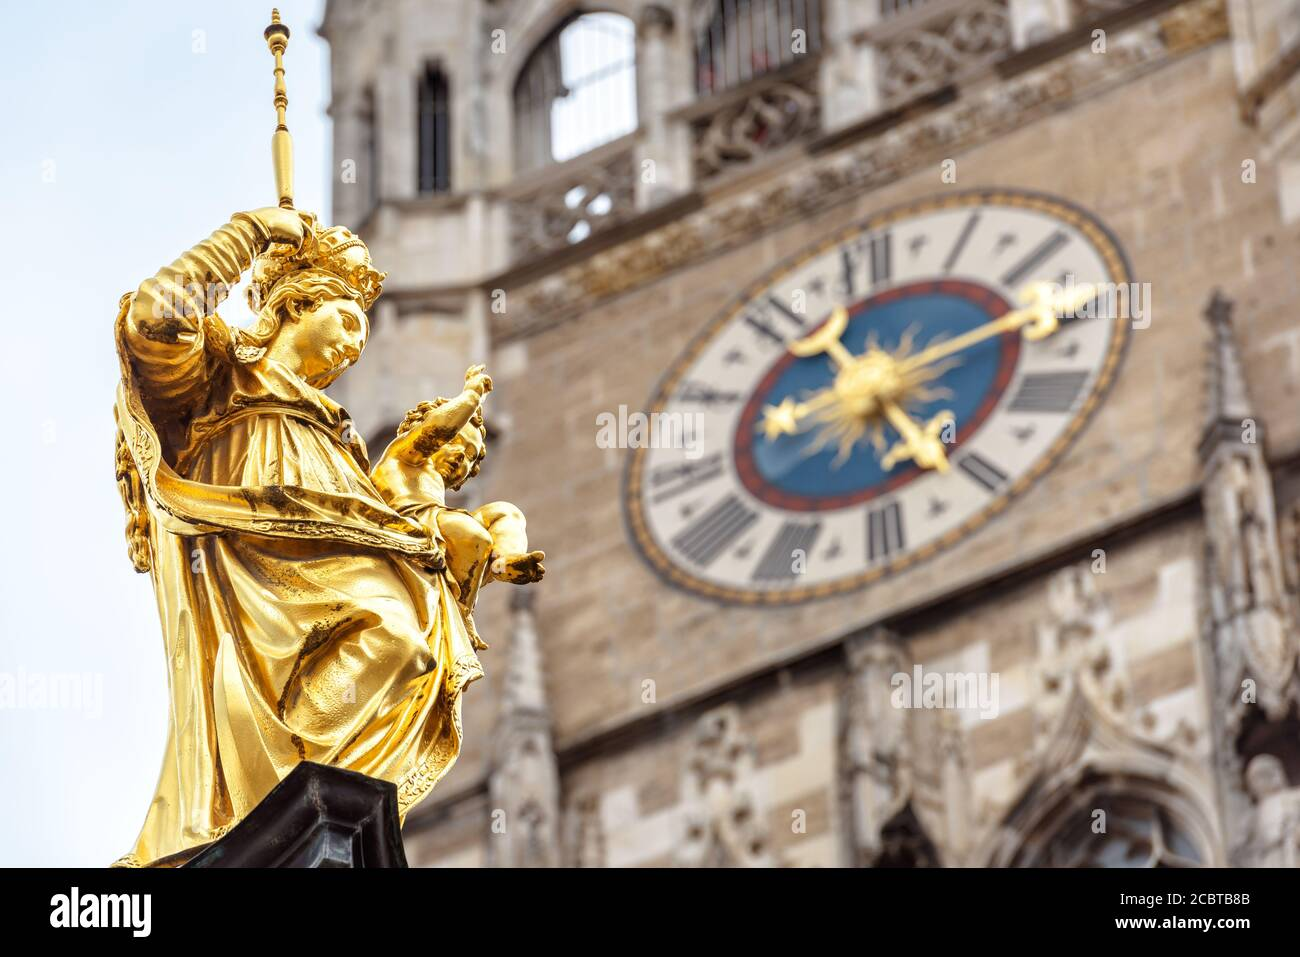 Virgin Mary statue closeup in Marienplatz square, Munich, Germany. This place is a top landmark of Munich. Golden sculpture atop Mariensaule column on Stock Photo